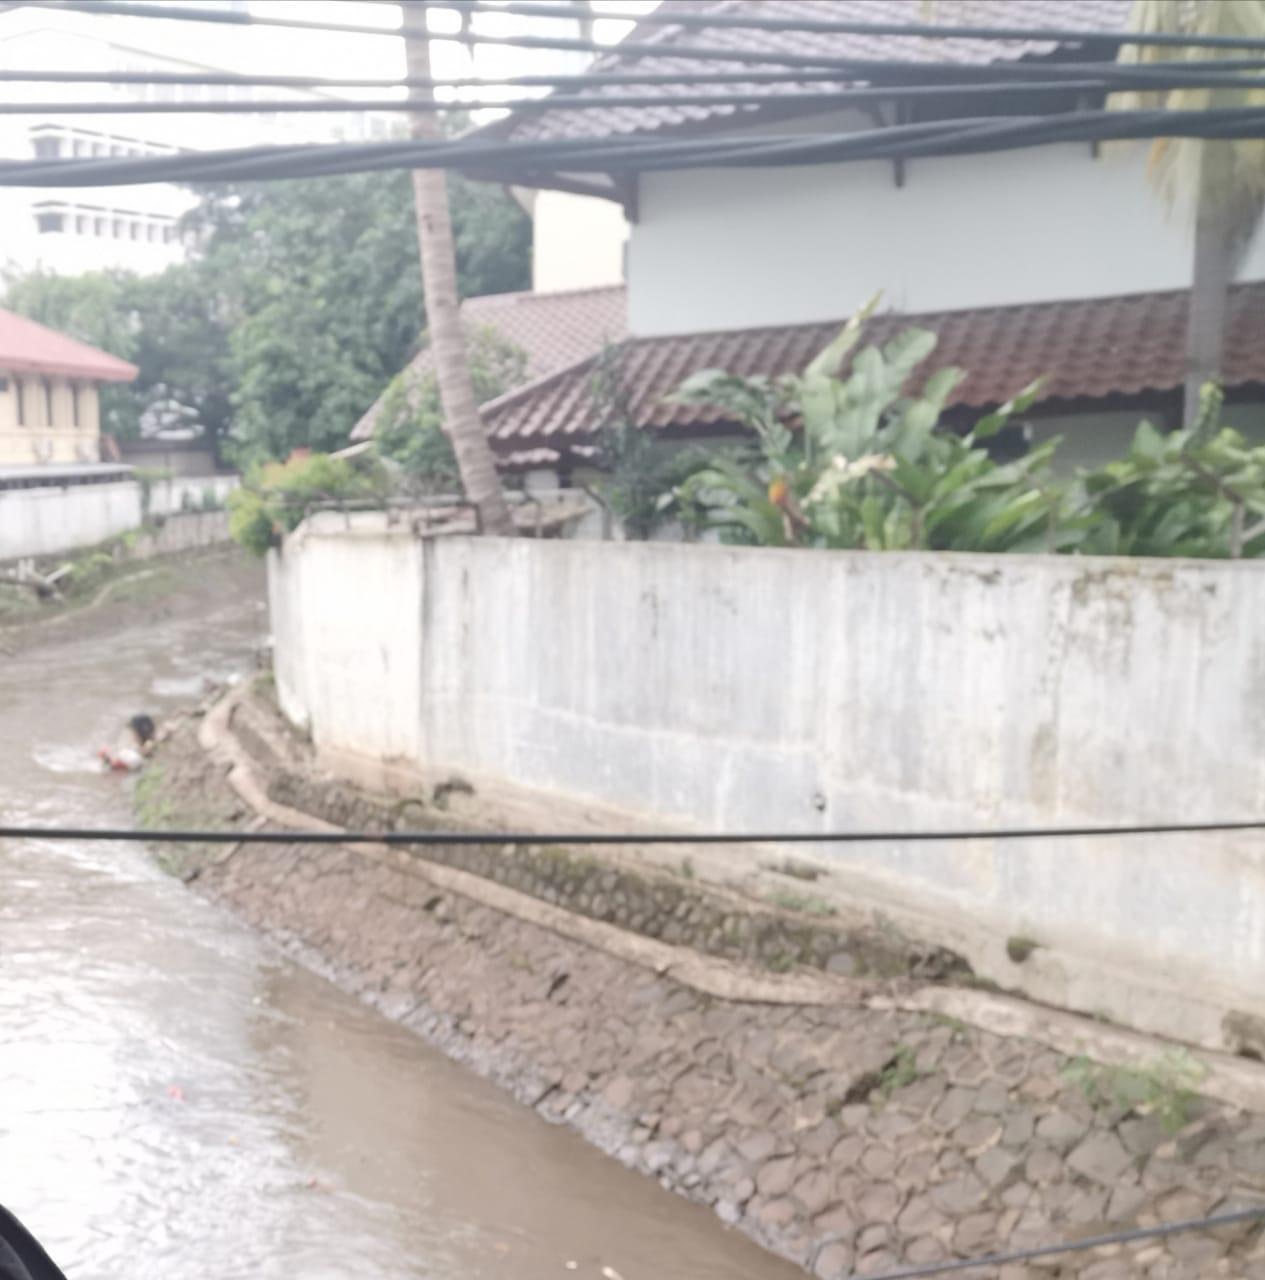 Terancam Disegel, Bangunan di Jalan Widya Candra X No 7 Diduga Tak Punya IMB